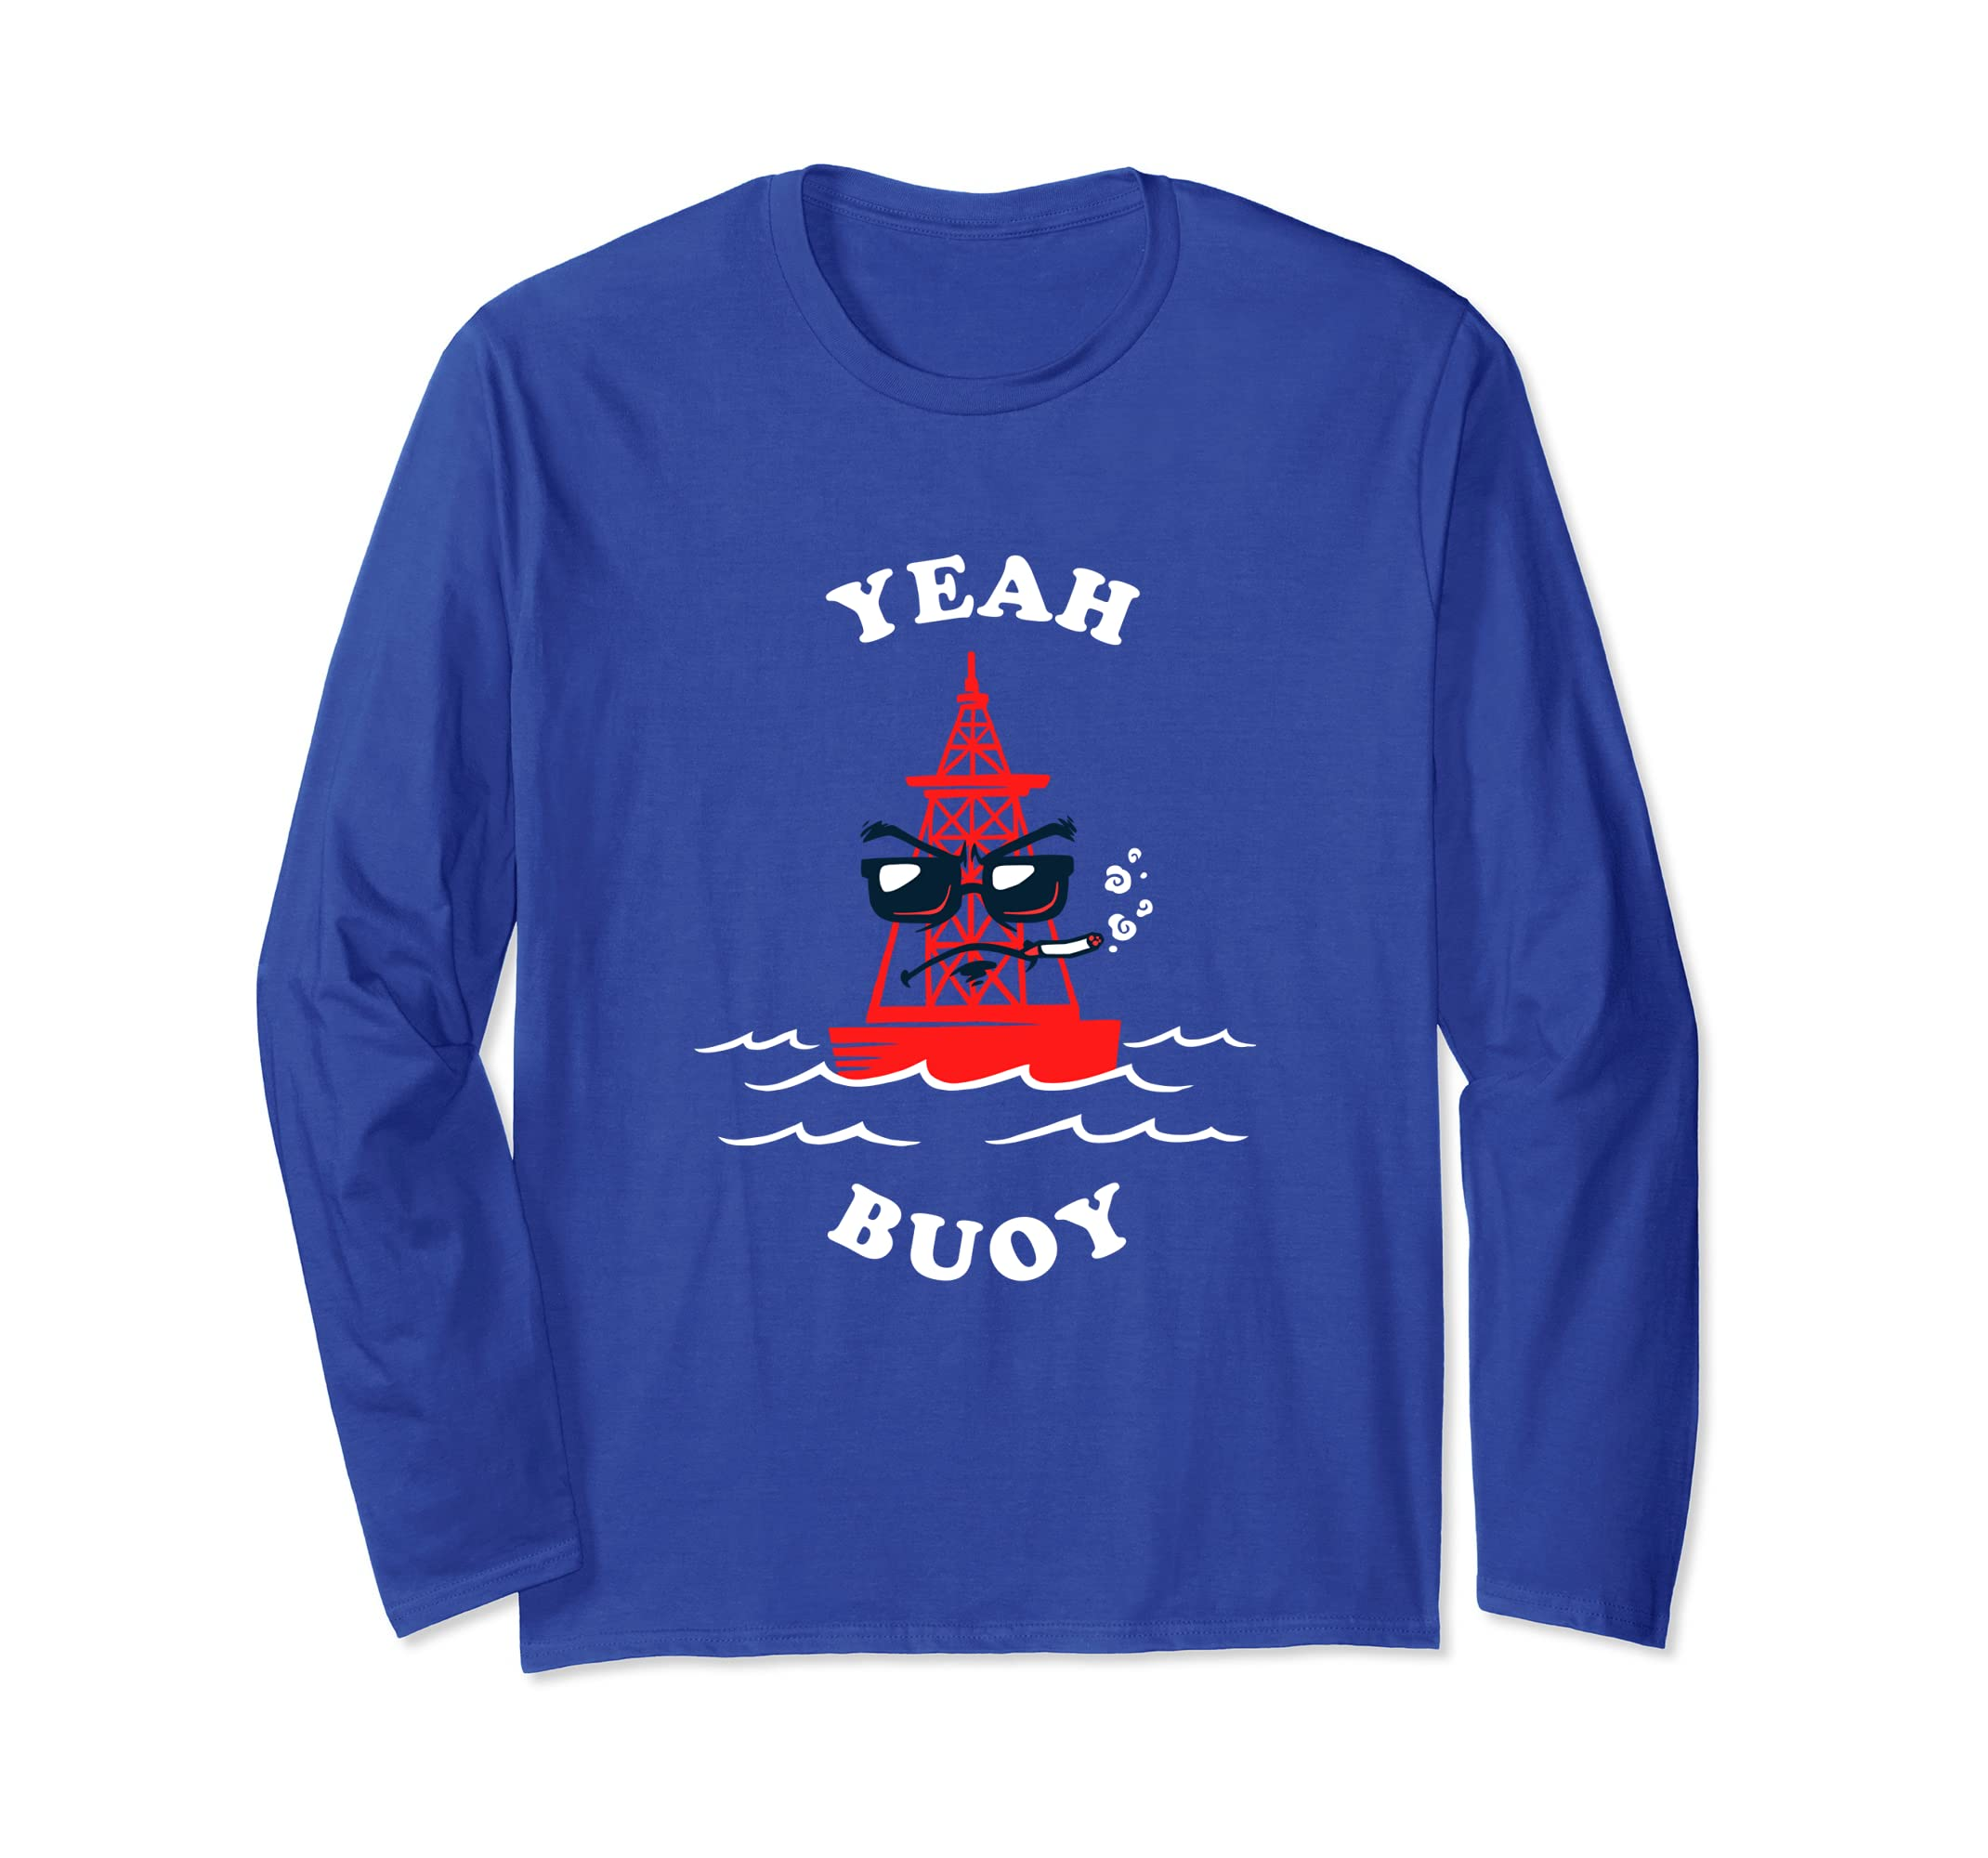 e04a31d5 Amazon.com: Yeah Buoy Long Sleeve Shirt: Clothing